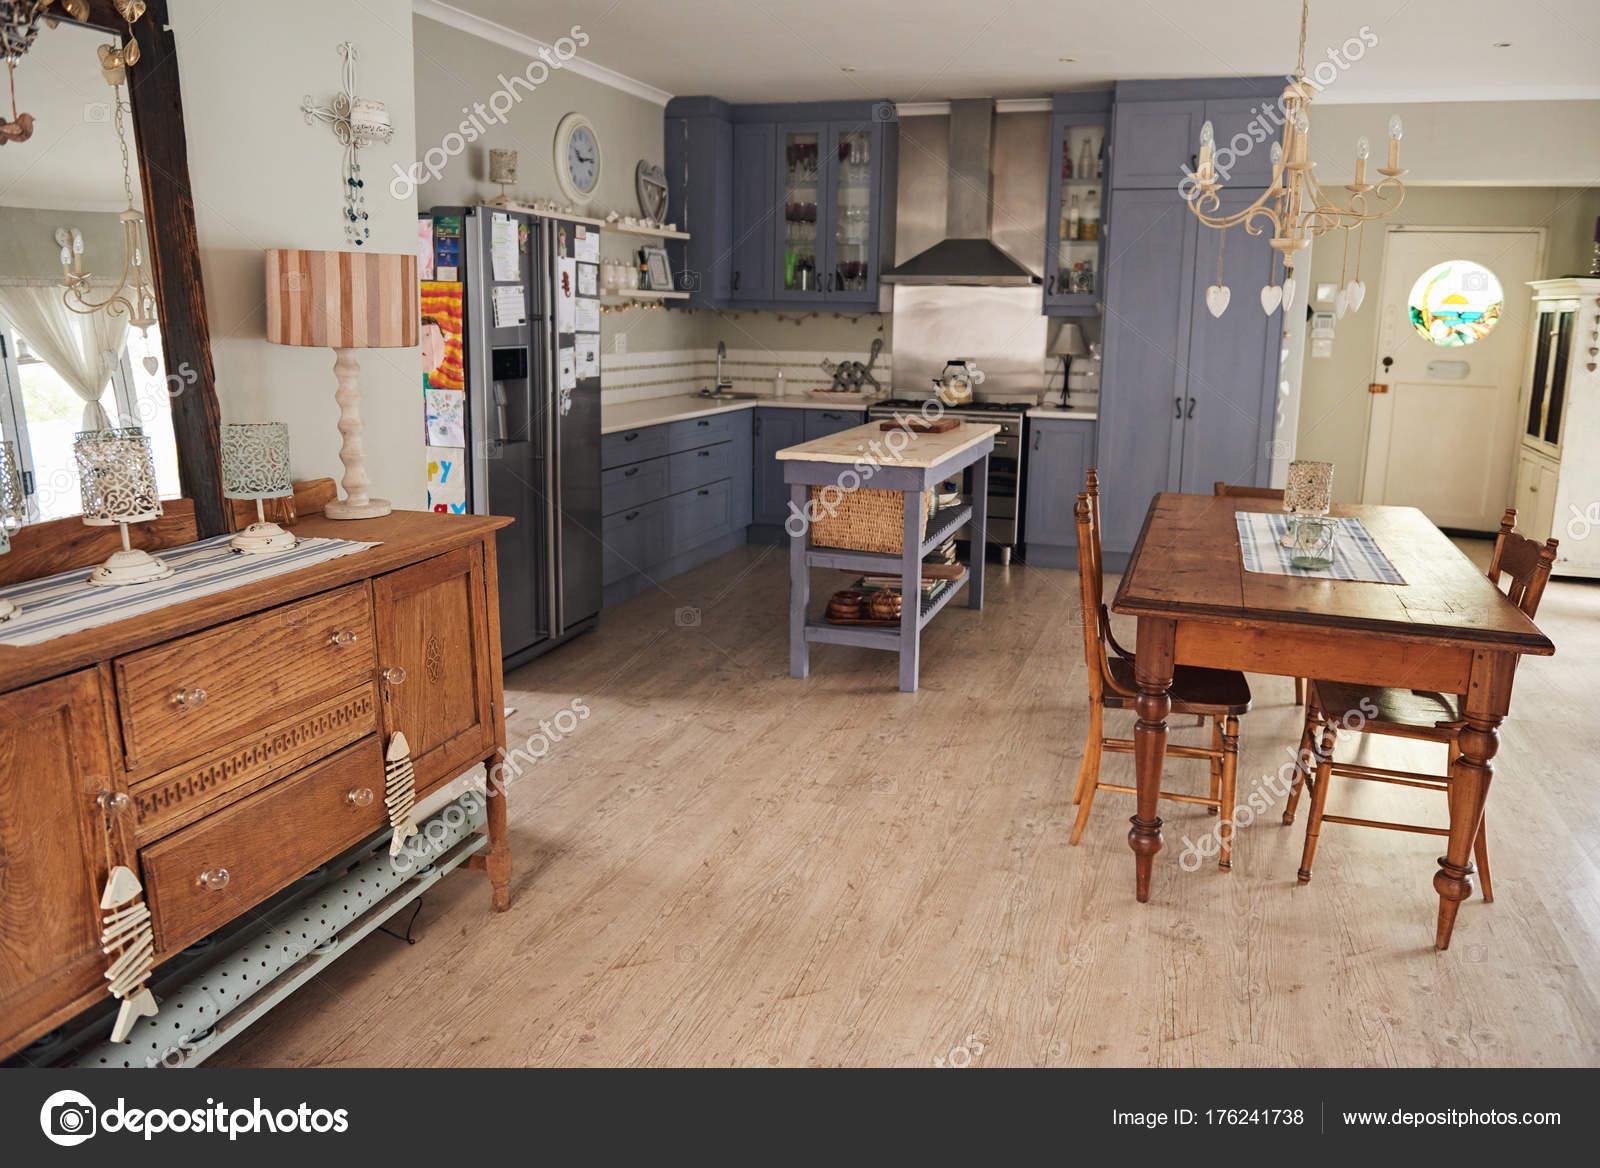 cocina estilo Country — Fotos de Stock © mavoimages #176241738